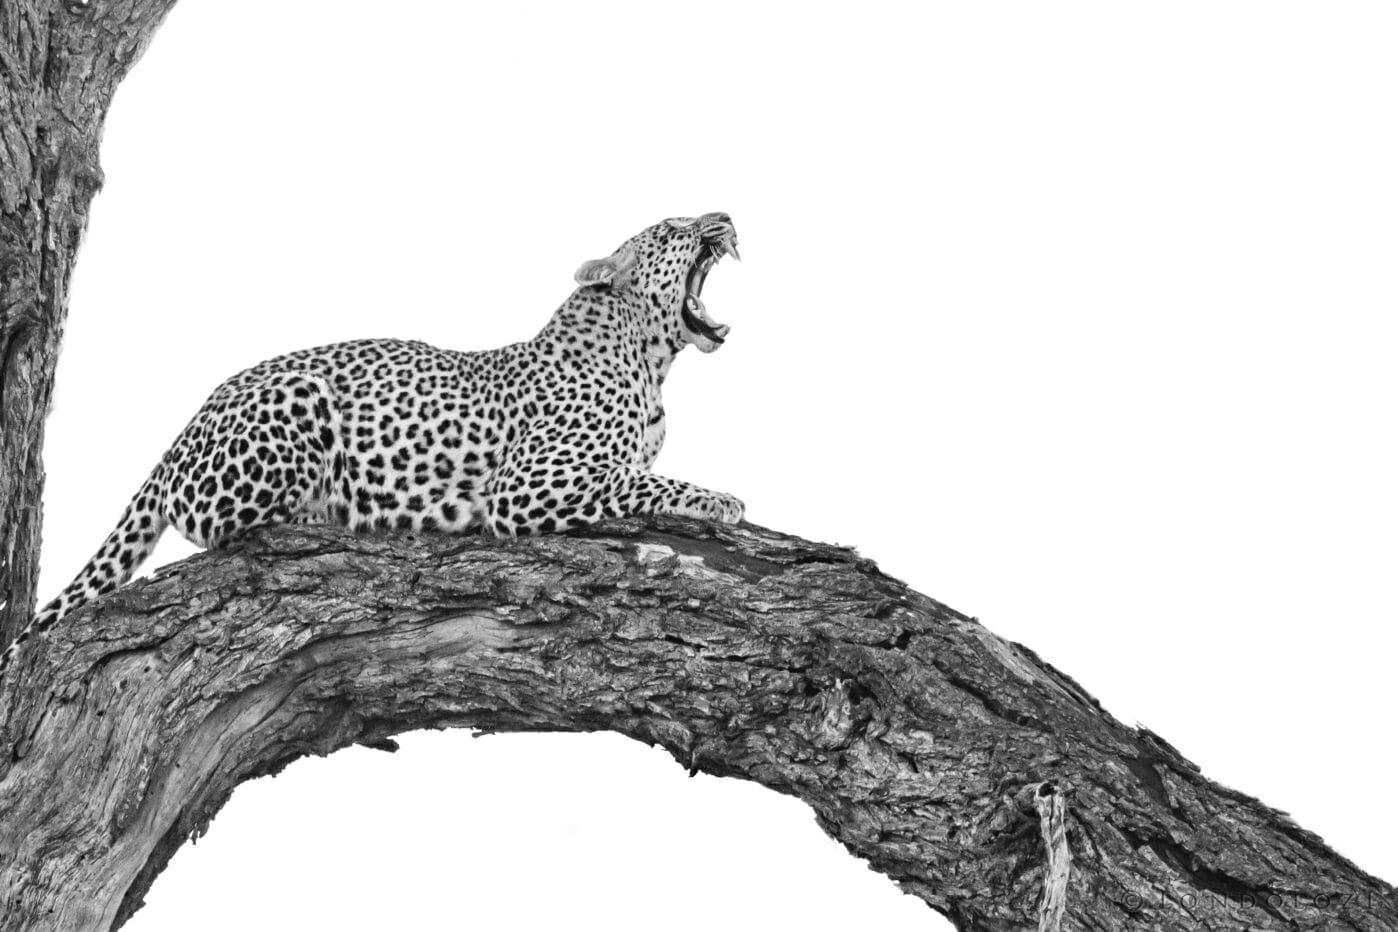 Nkoveni, yawn, dead tree - AJ 2018